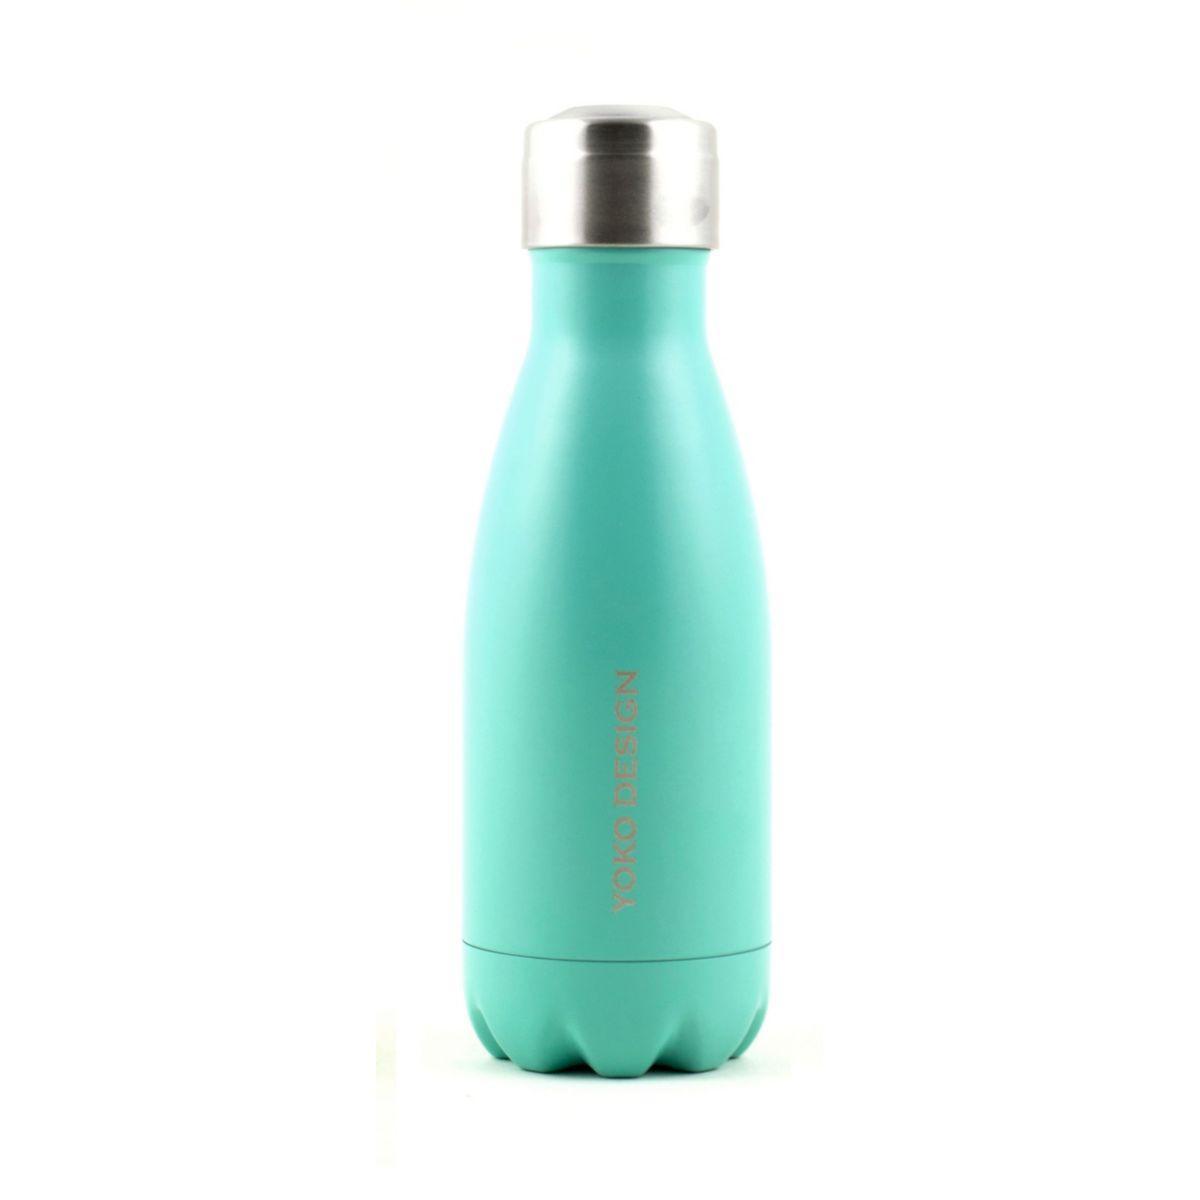 Bouteille isotherme yoko isotherme 260 ml turquoise mat - 20% de remise imm�diate avec l